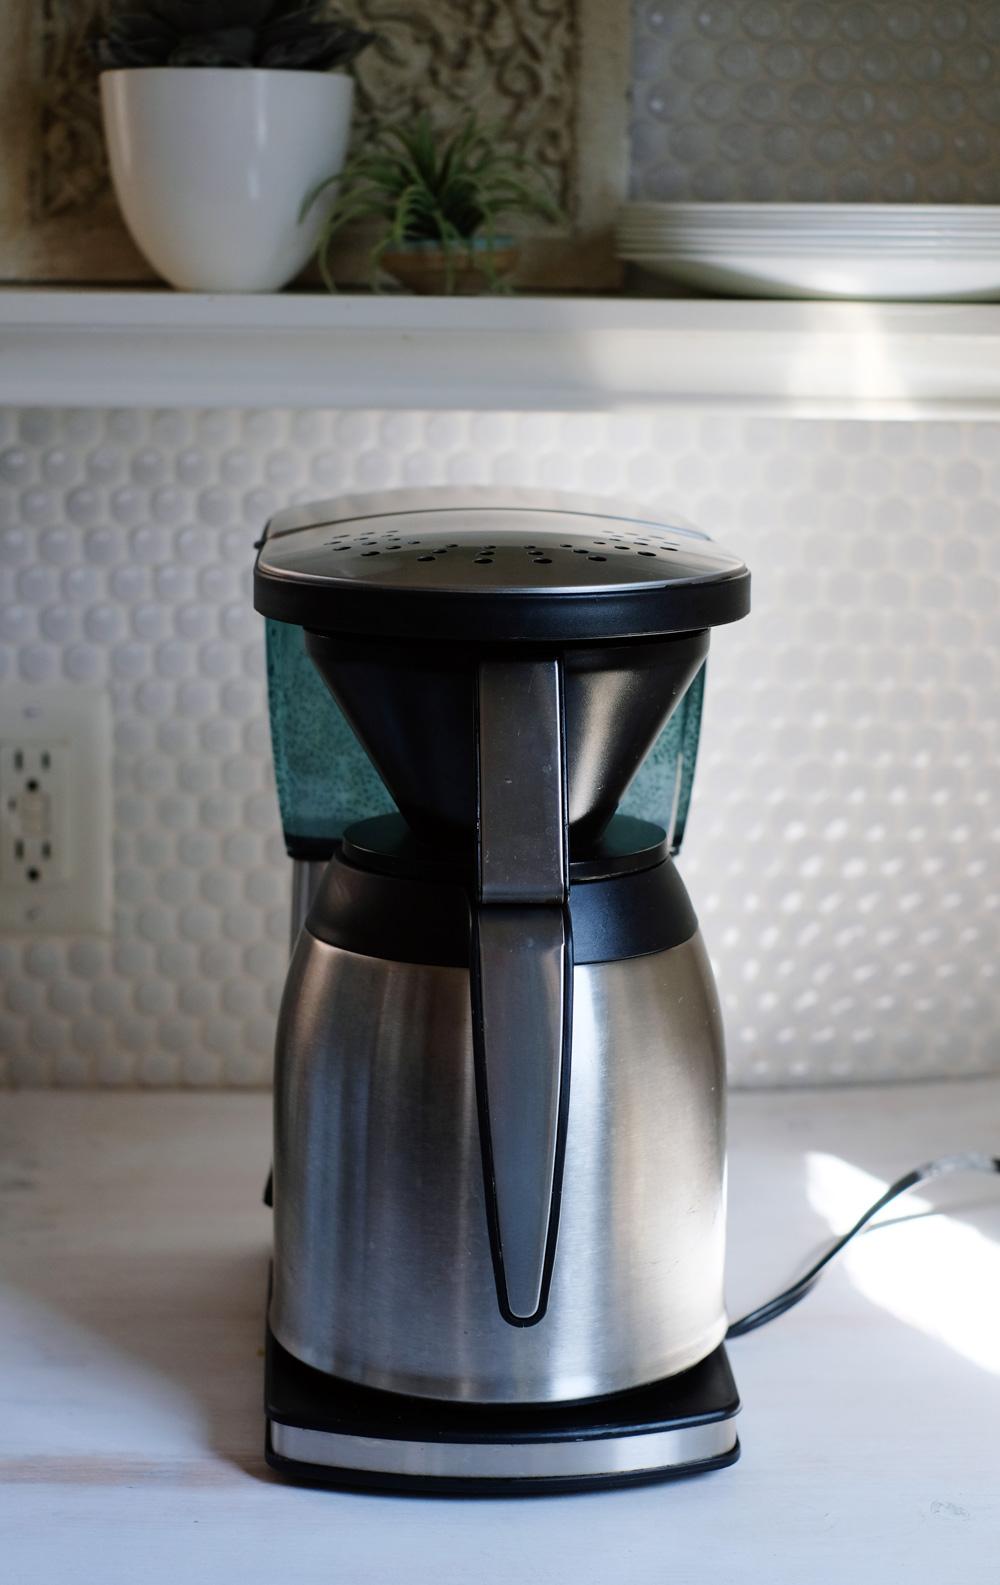 Bonavita_RebootRoasting_CoffeeMachine_06.jpg